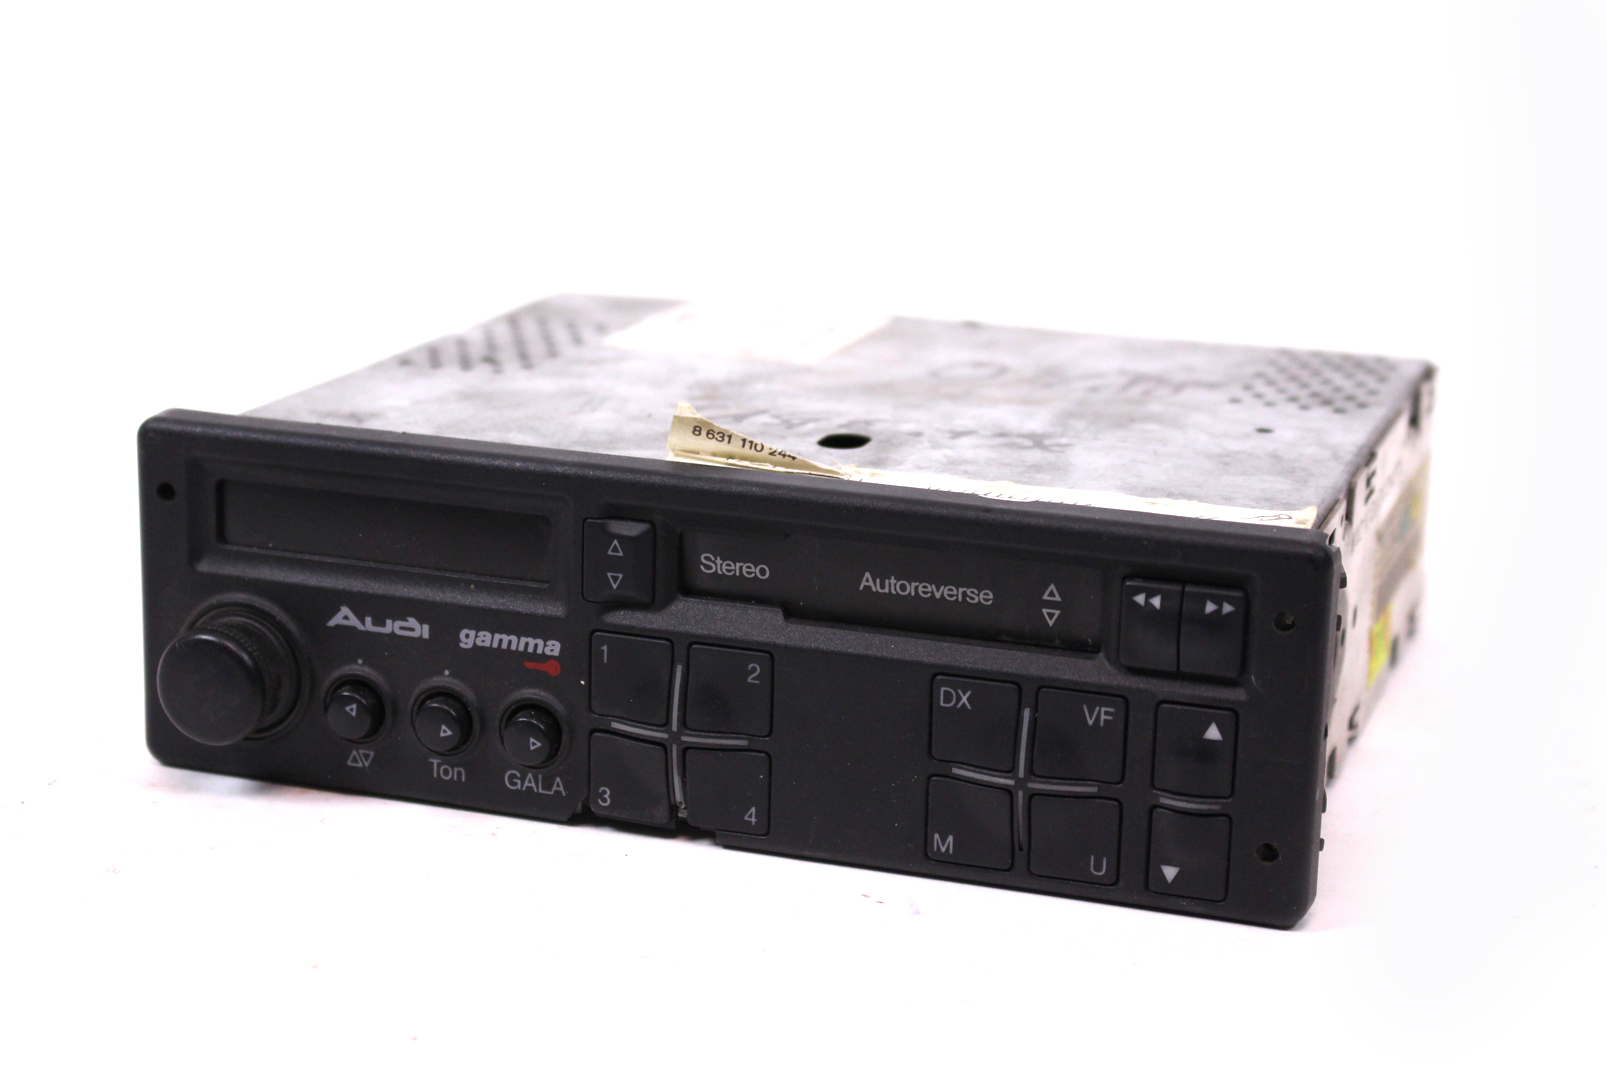 orig audi gamma stereo mc autoradio kassette audi 80 100 a3 a4 a6 893035186b ebay. Black Bedroom Furniture Sets. Home Design Ideas